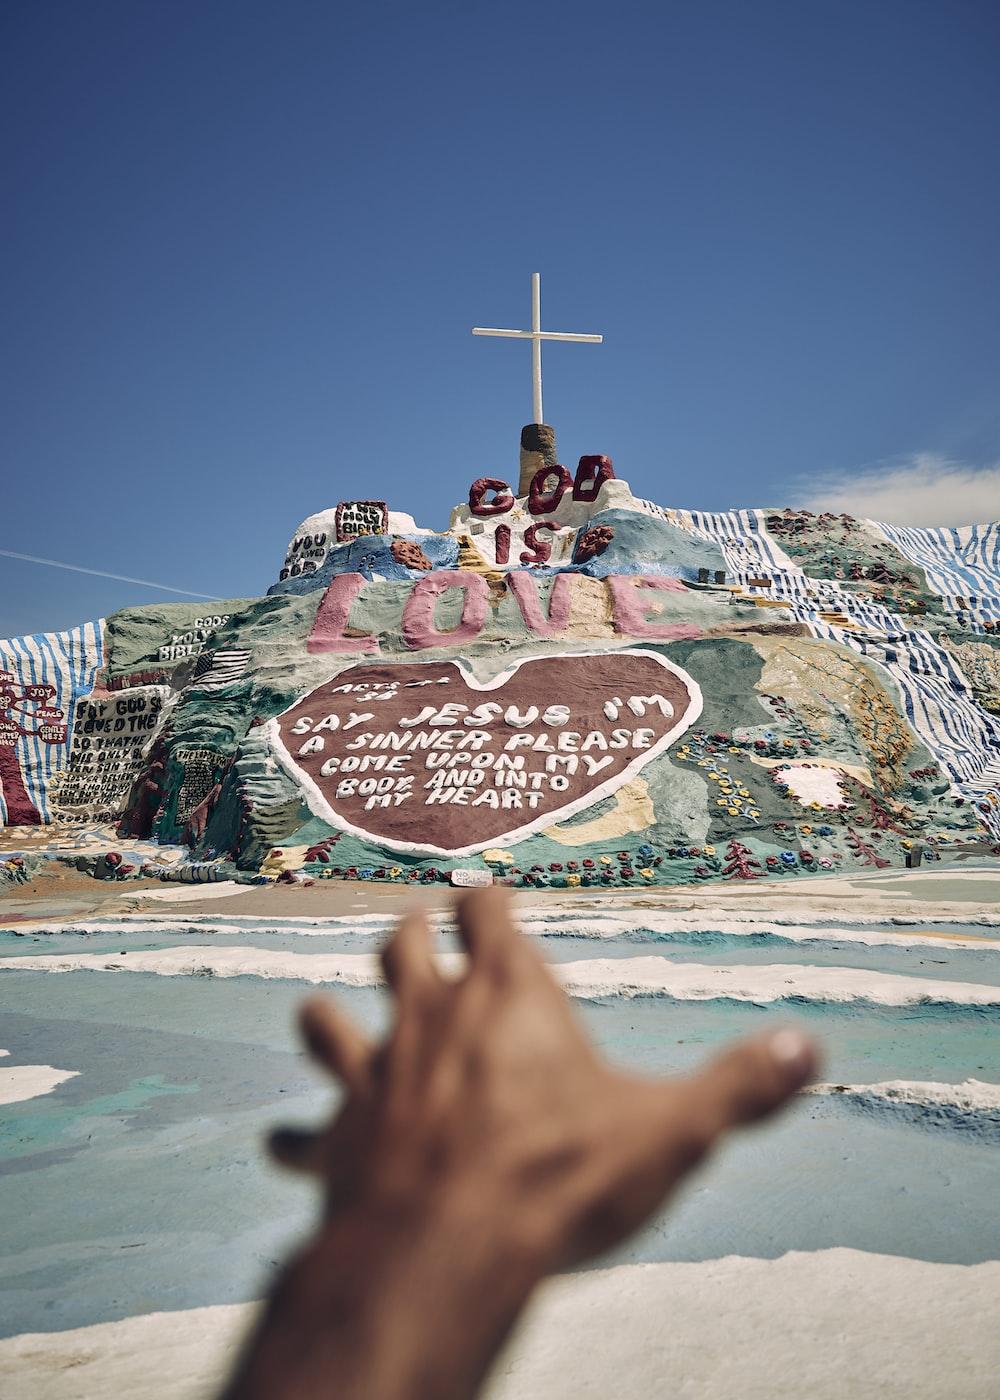 photo of bible quote-themed landmark